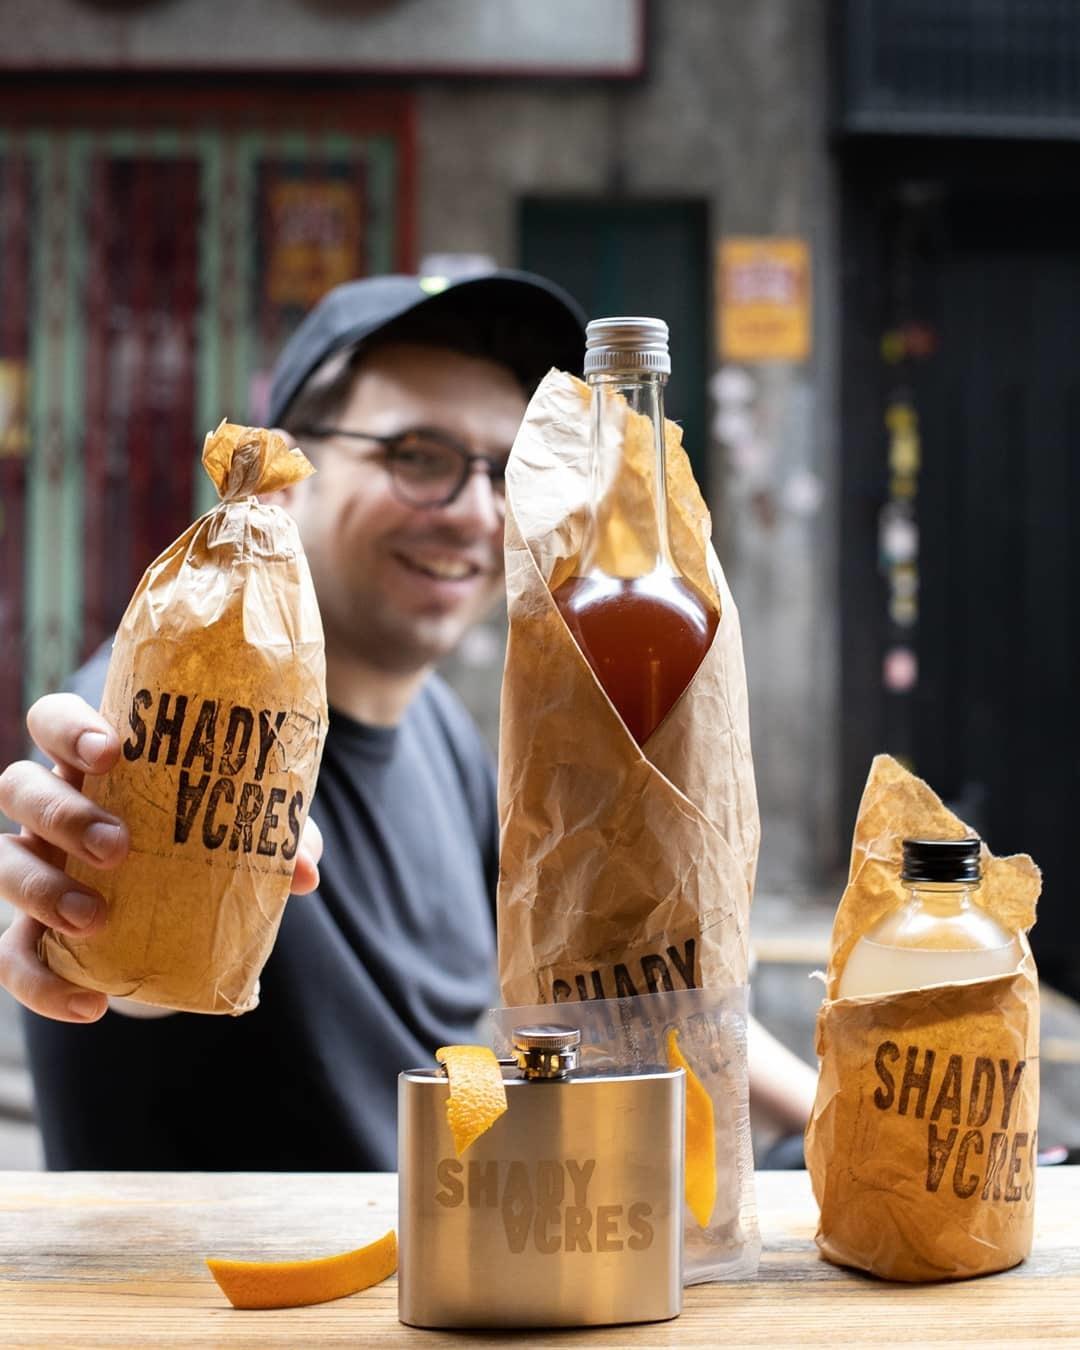 Shady Acres bottled cocktails